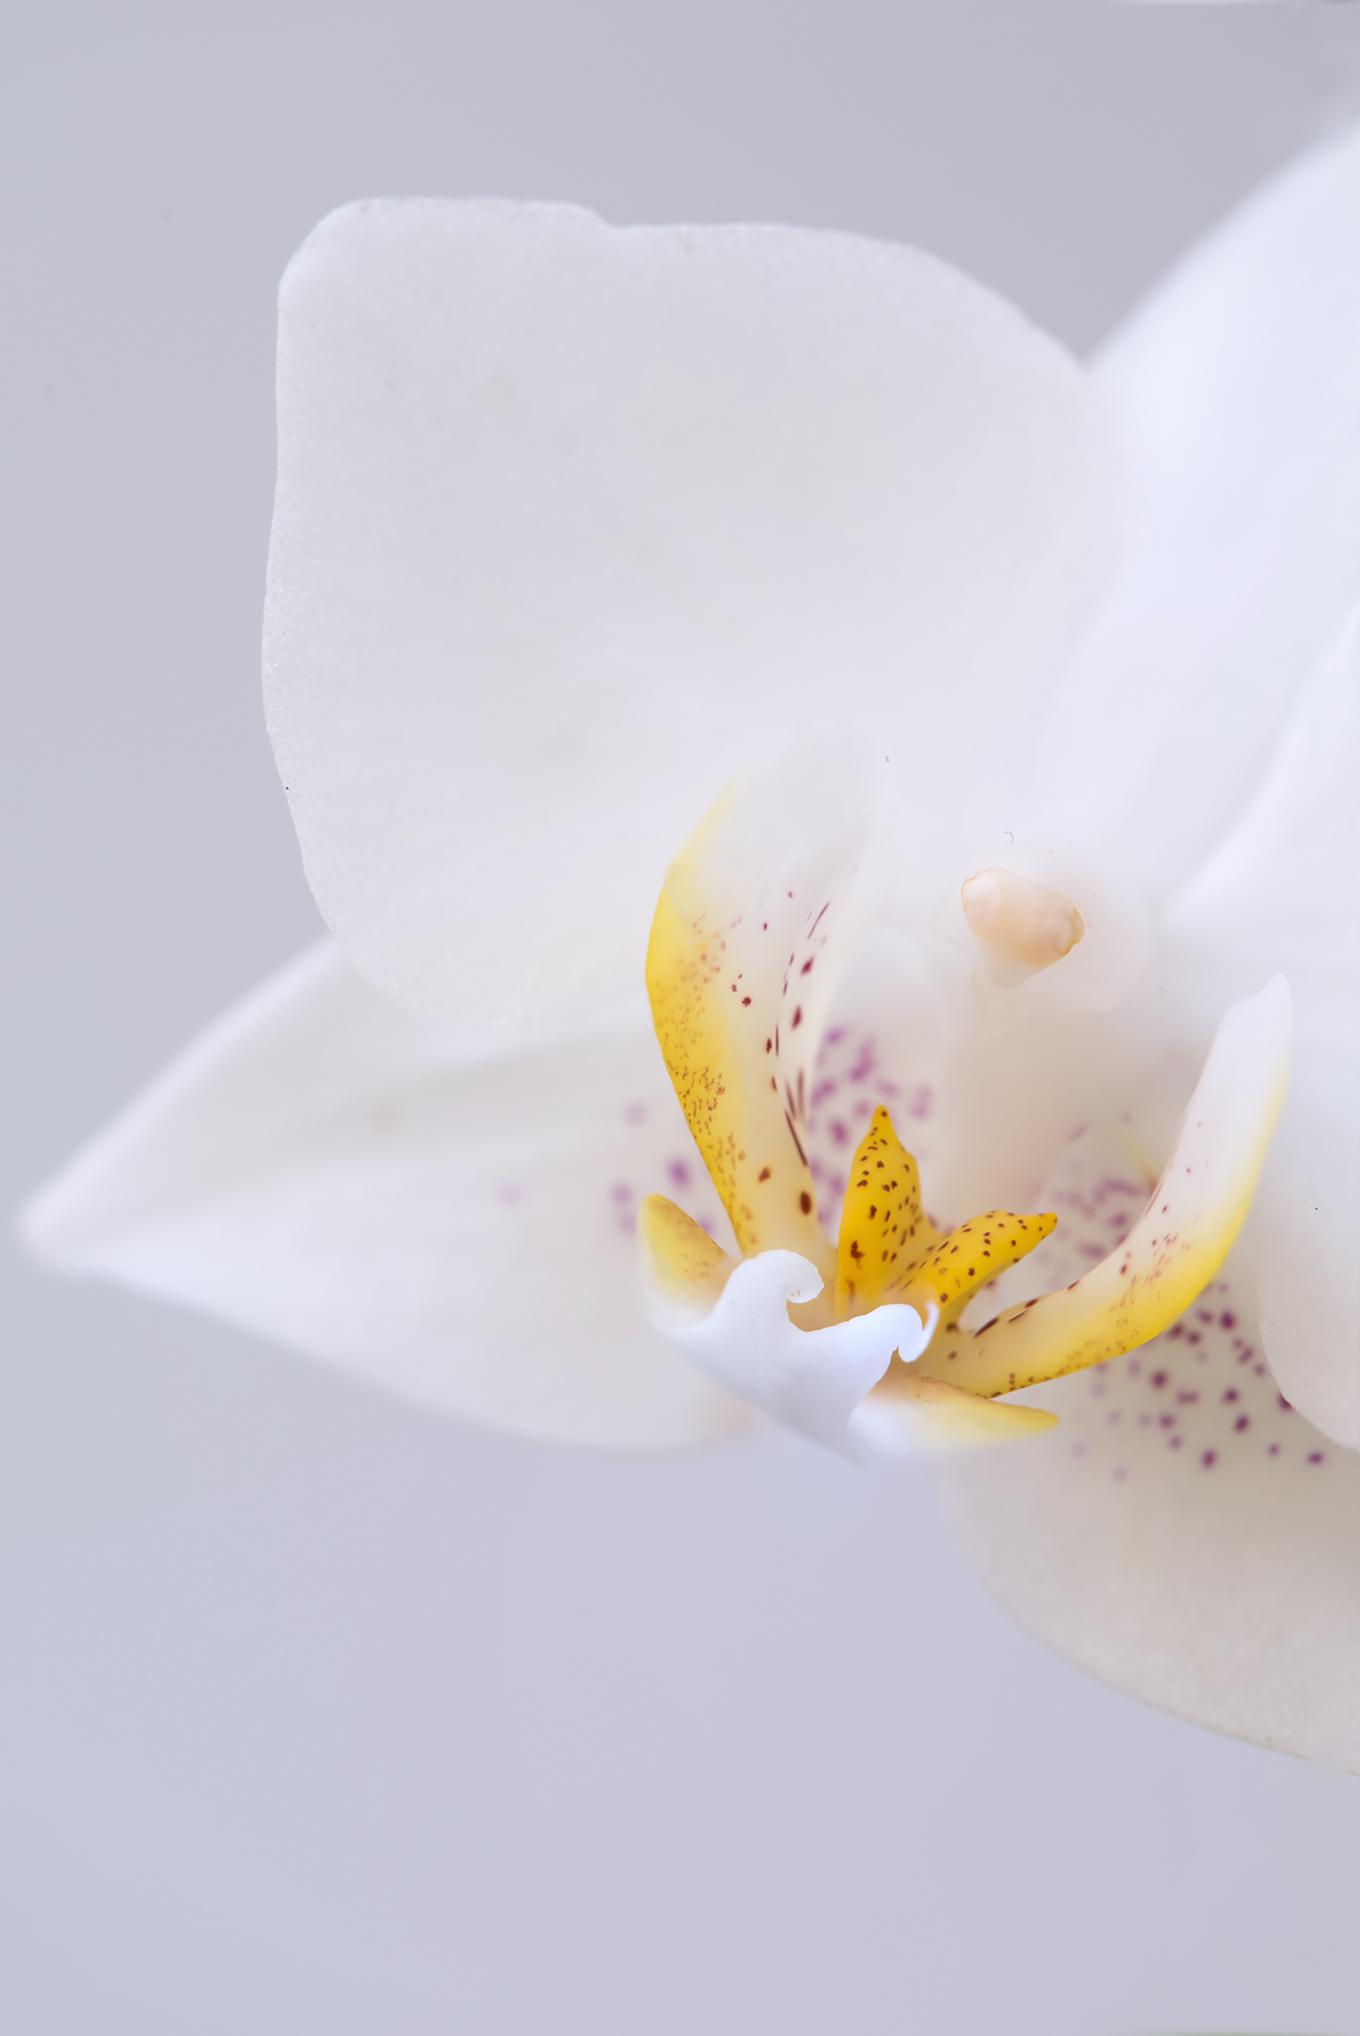 Orchid Details - Bachmann Garden Center, MN  Nikon D810 + Tamron 180mm f/3.5 Macro